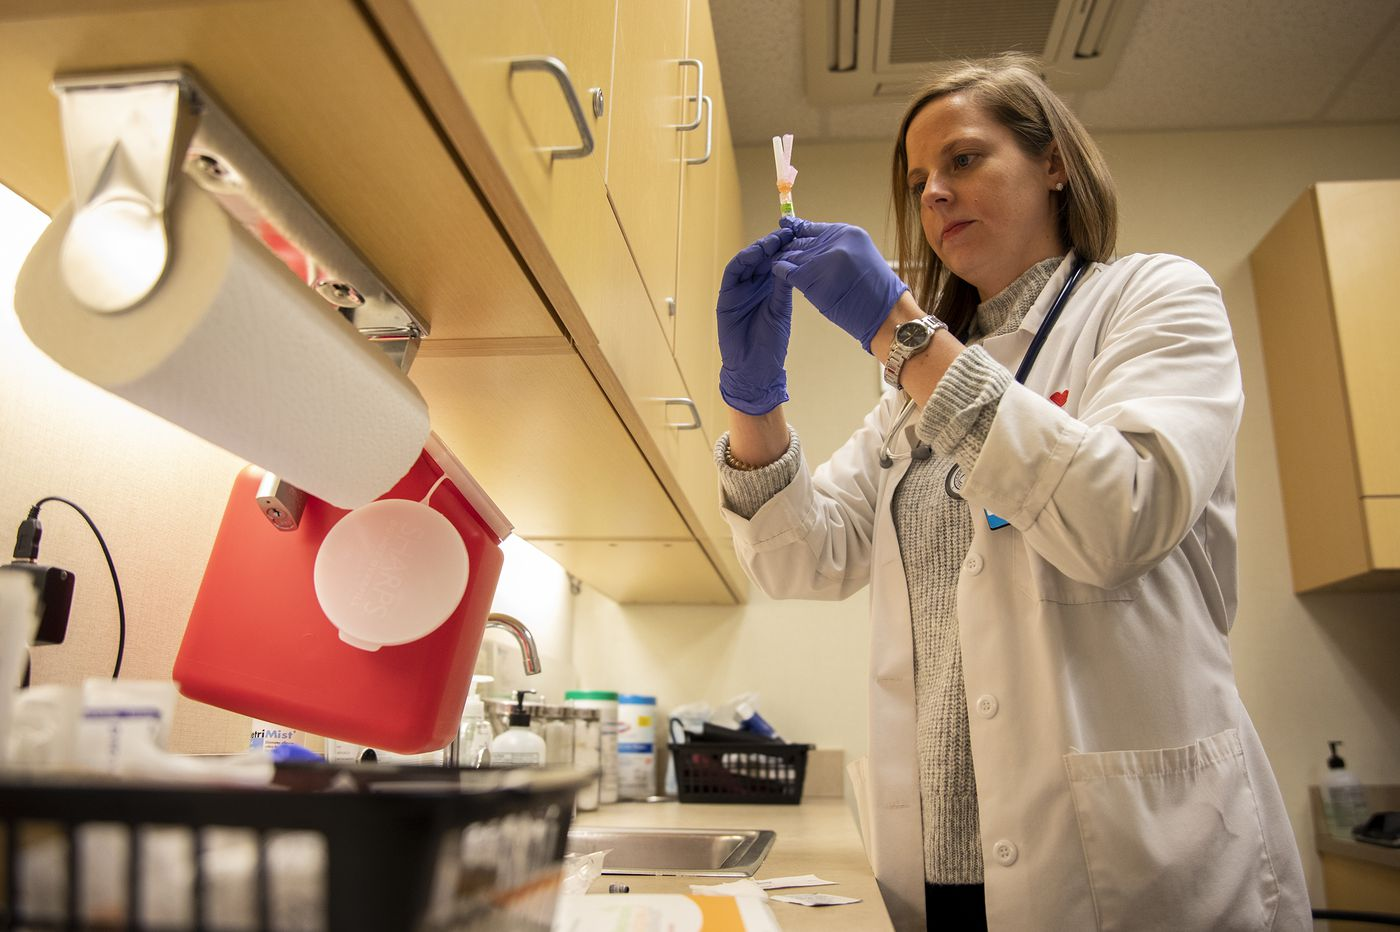 The flu could make things worse | Coronavirus Newsletter